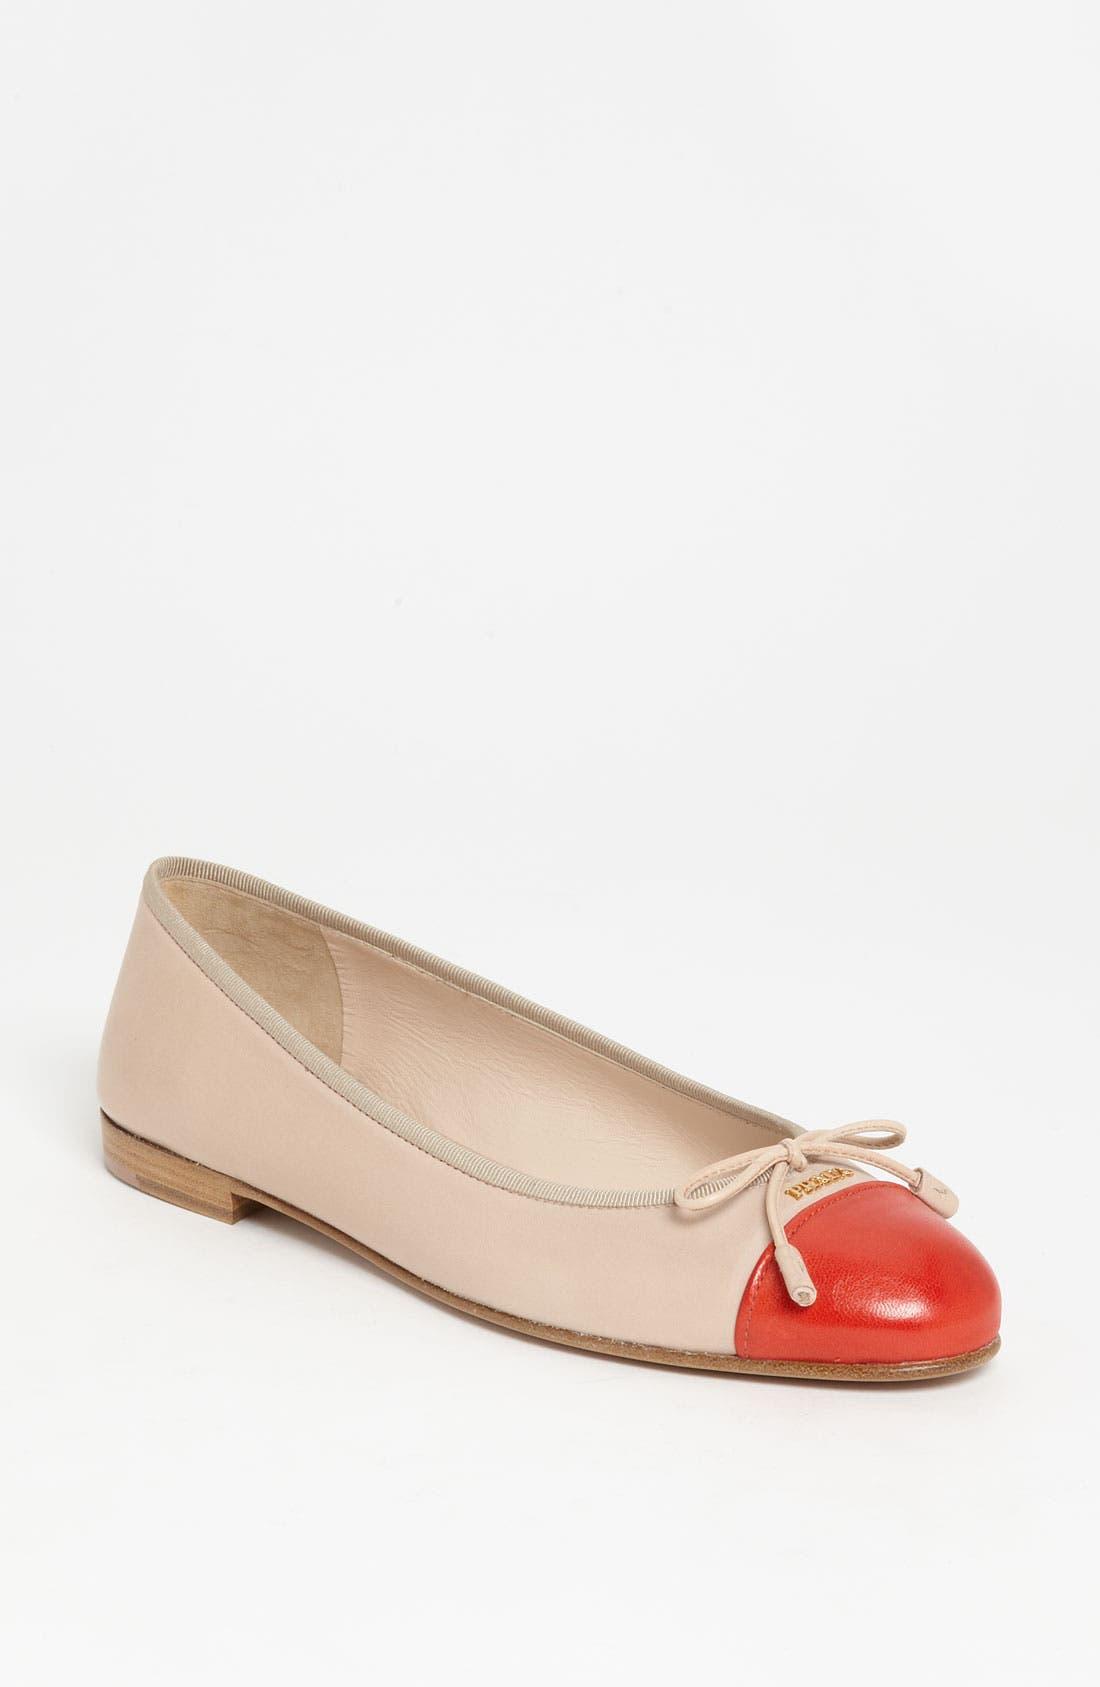 Alternate Image 1 Selected - Prada Bow Ballerina Flat